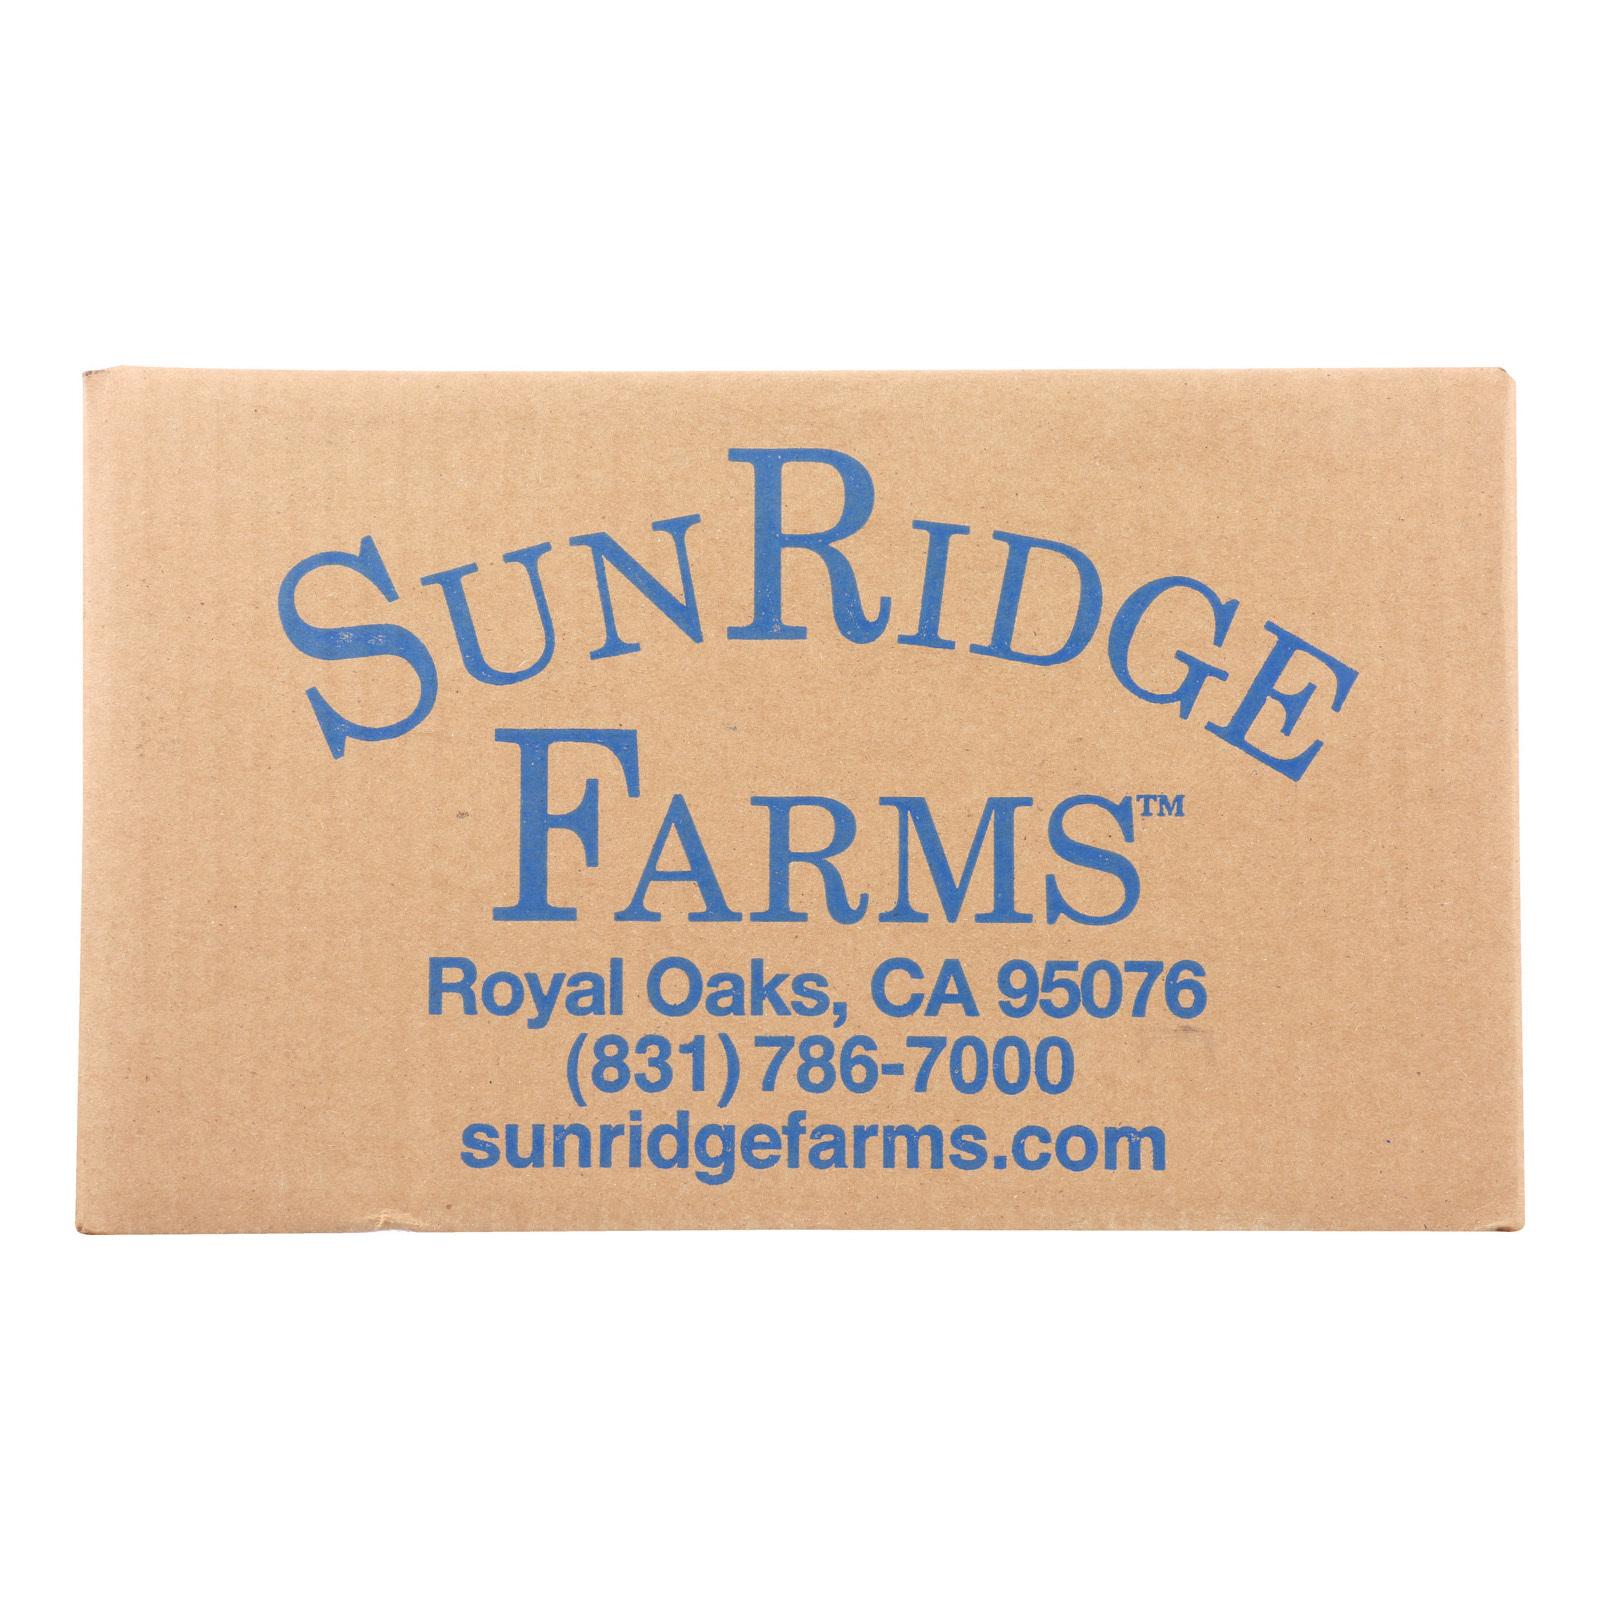 Sunridge Farms All Natural Dark Chocolate Blueberries - Case of 10 - 1 lb.